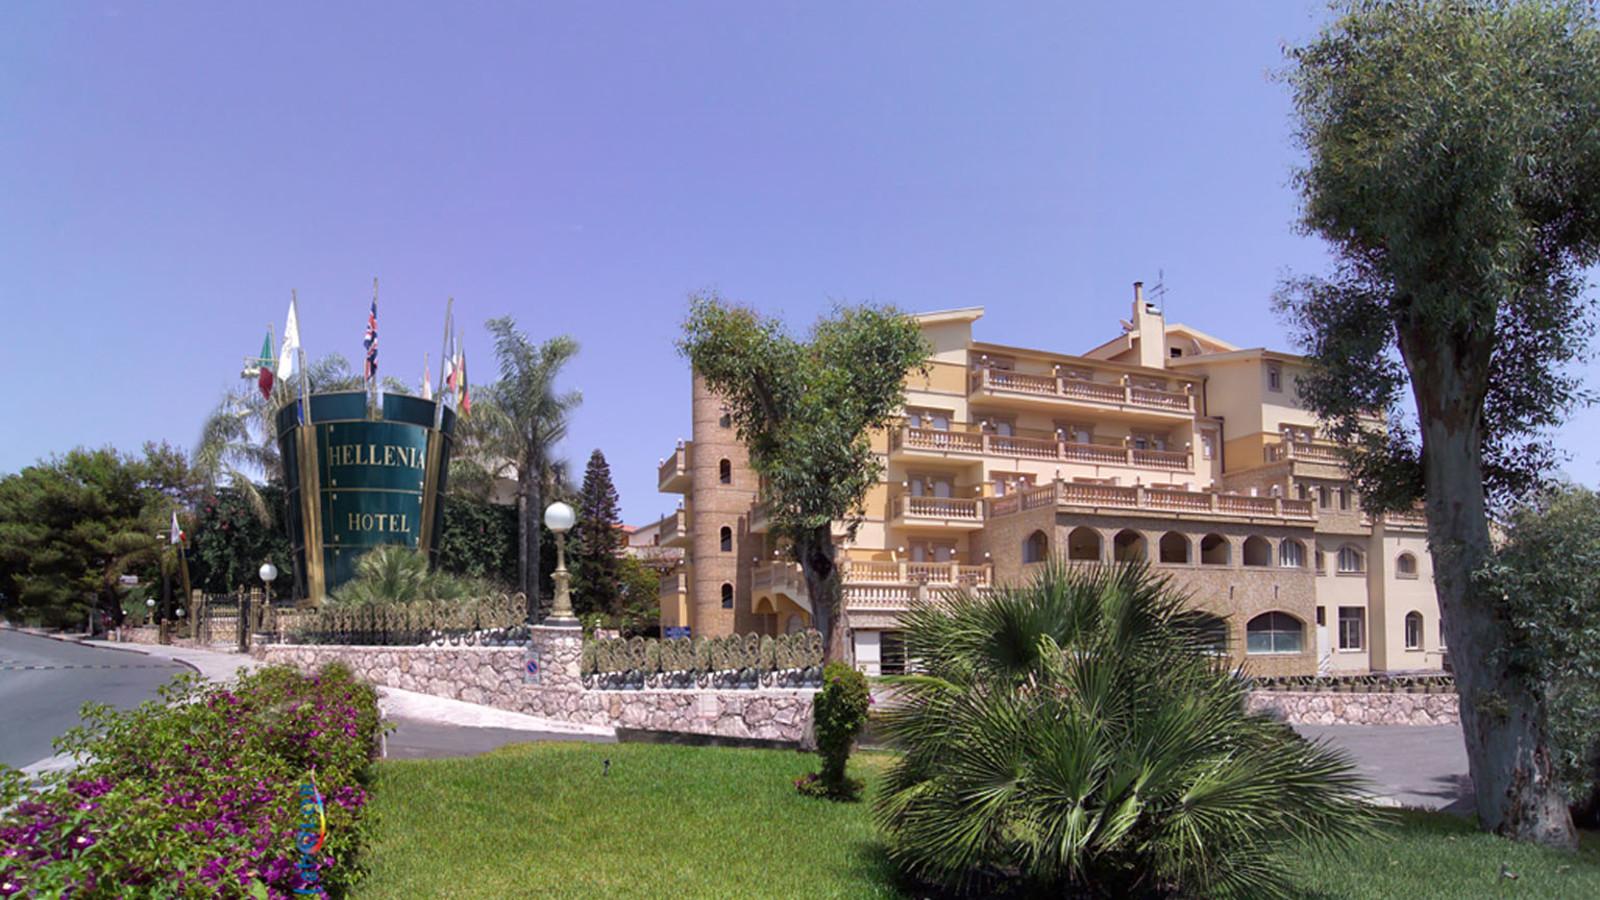 4 hellenia yachting hotel giardini naxos sicily topflight - Hotel la riva giardini naxos ...